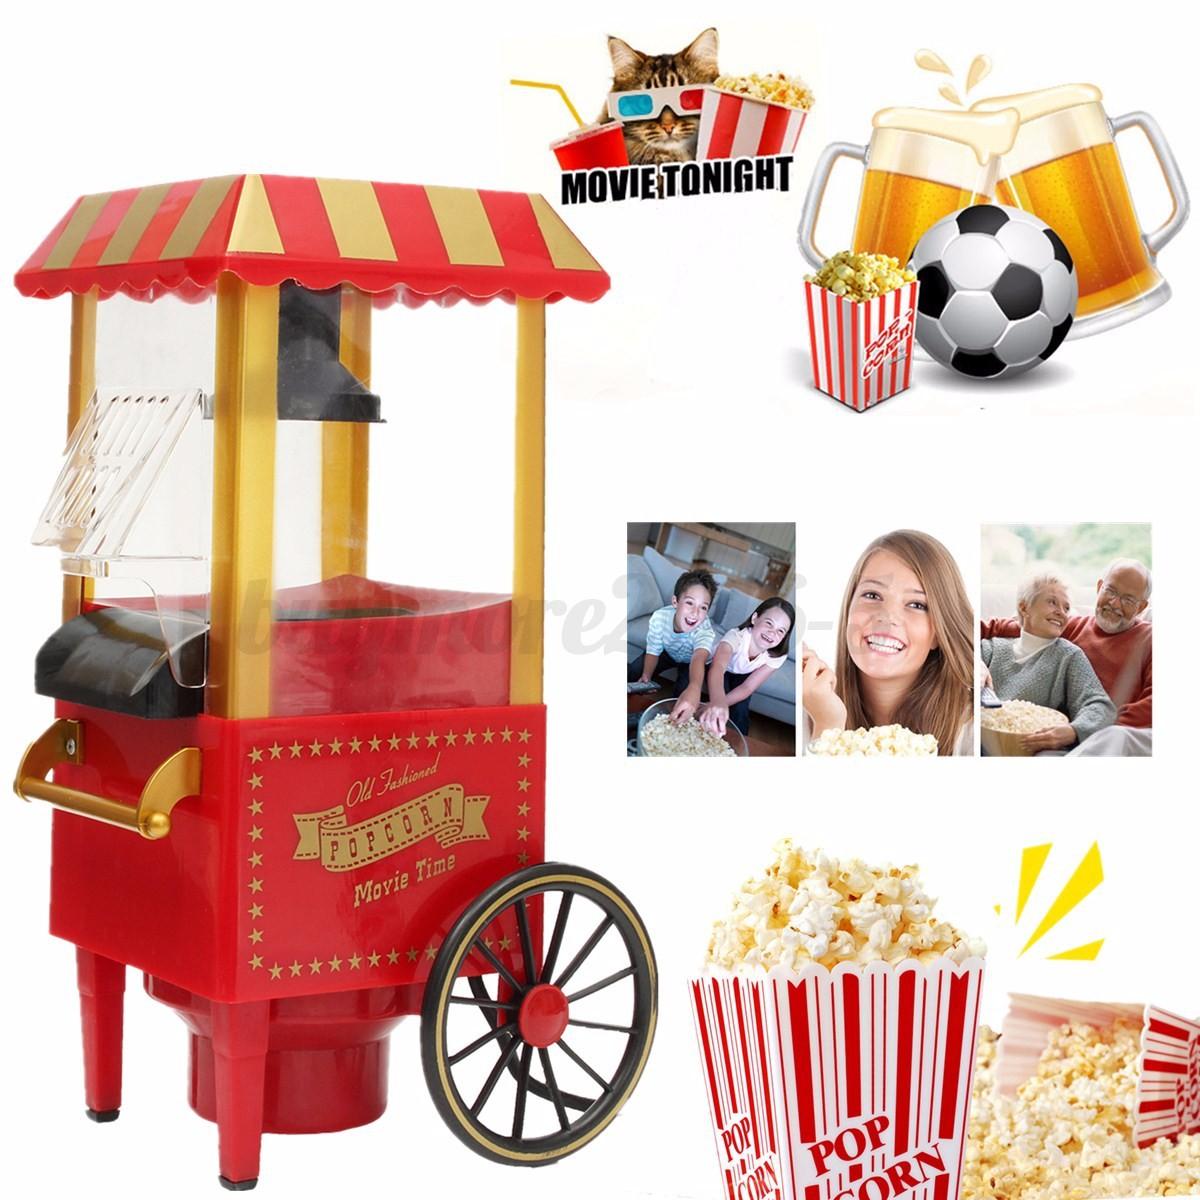 Electric Profession Pop Corn Popper Popcorn Maker Cooker Machine Home Party DIY